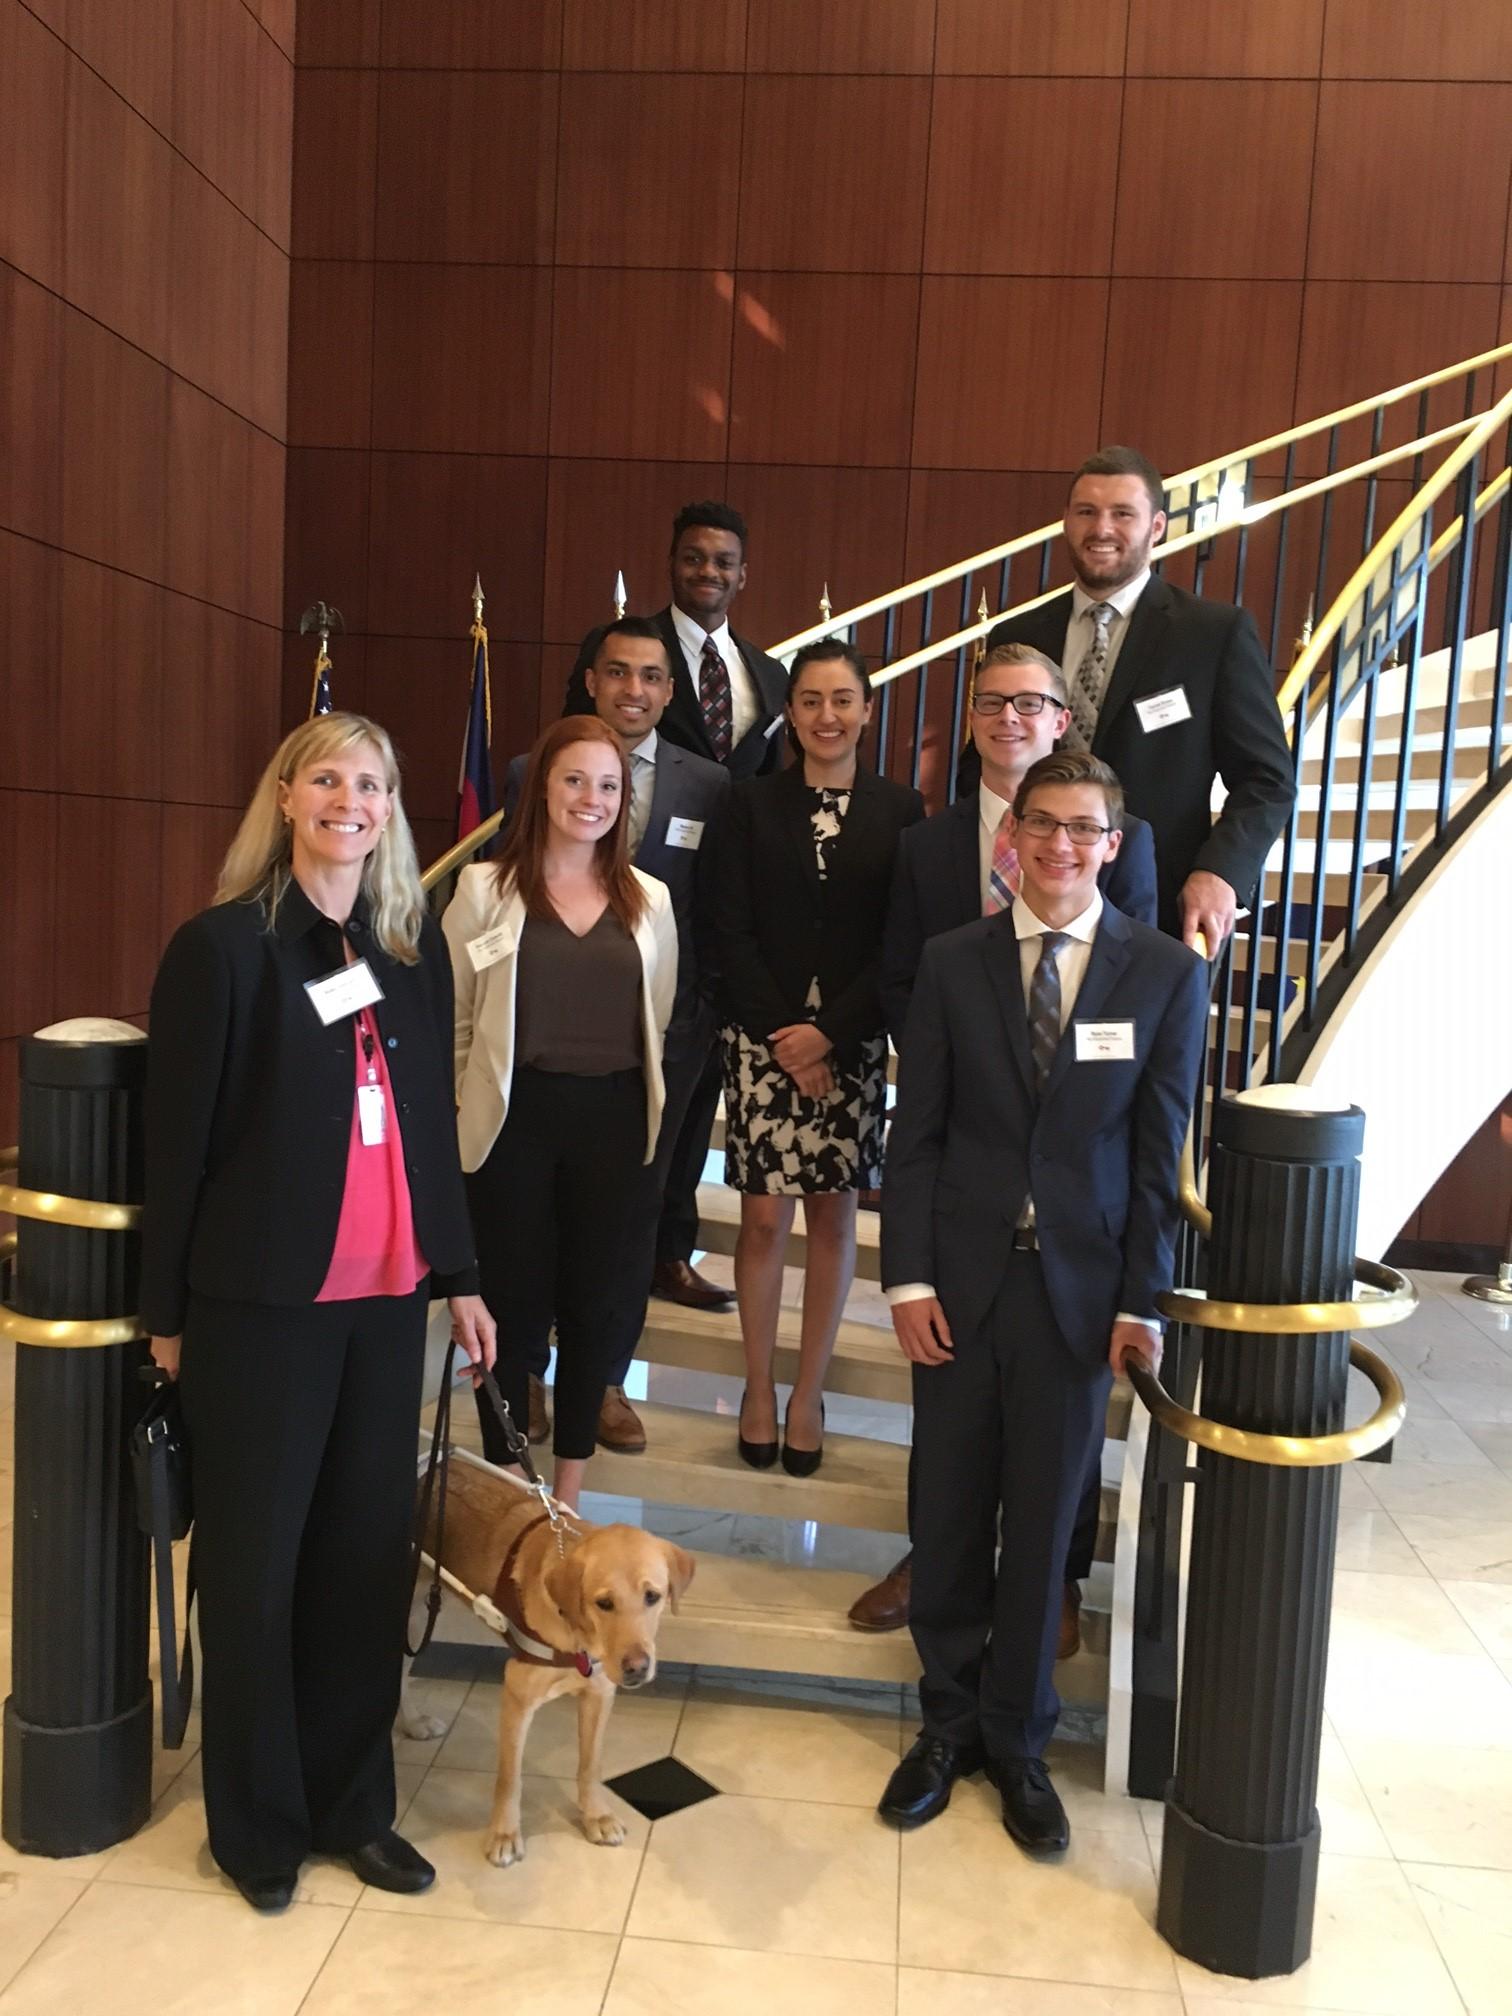 KEF_Interns_Team Photo on 55th FloorIMG_0628.jpg